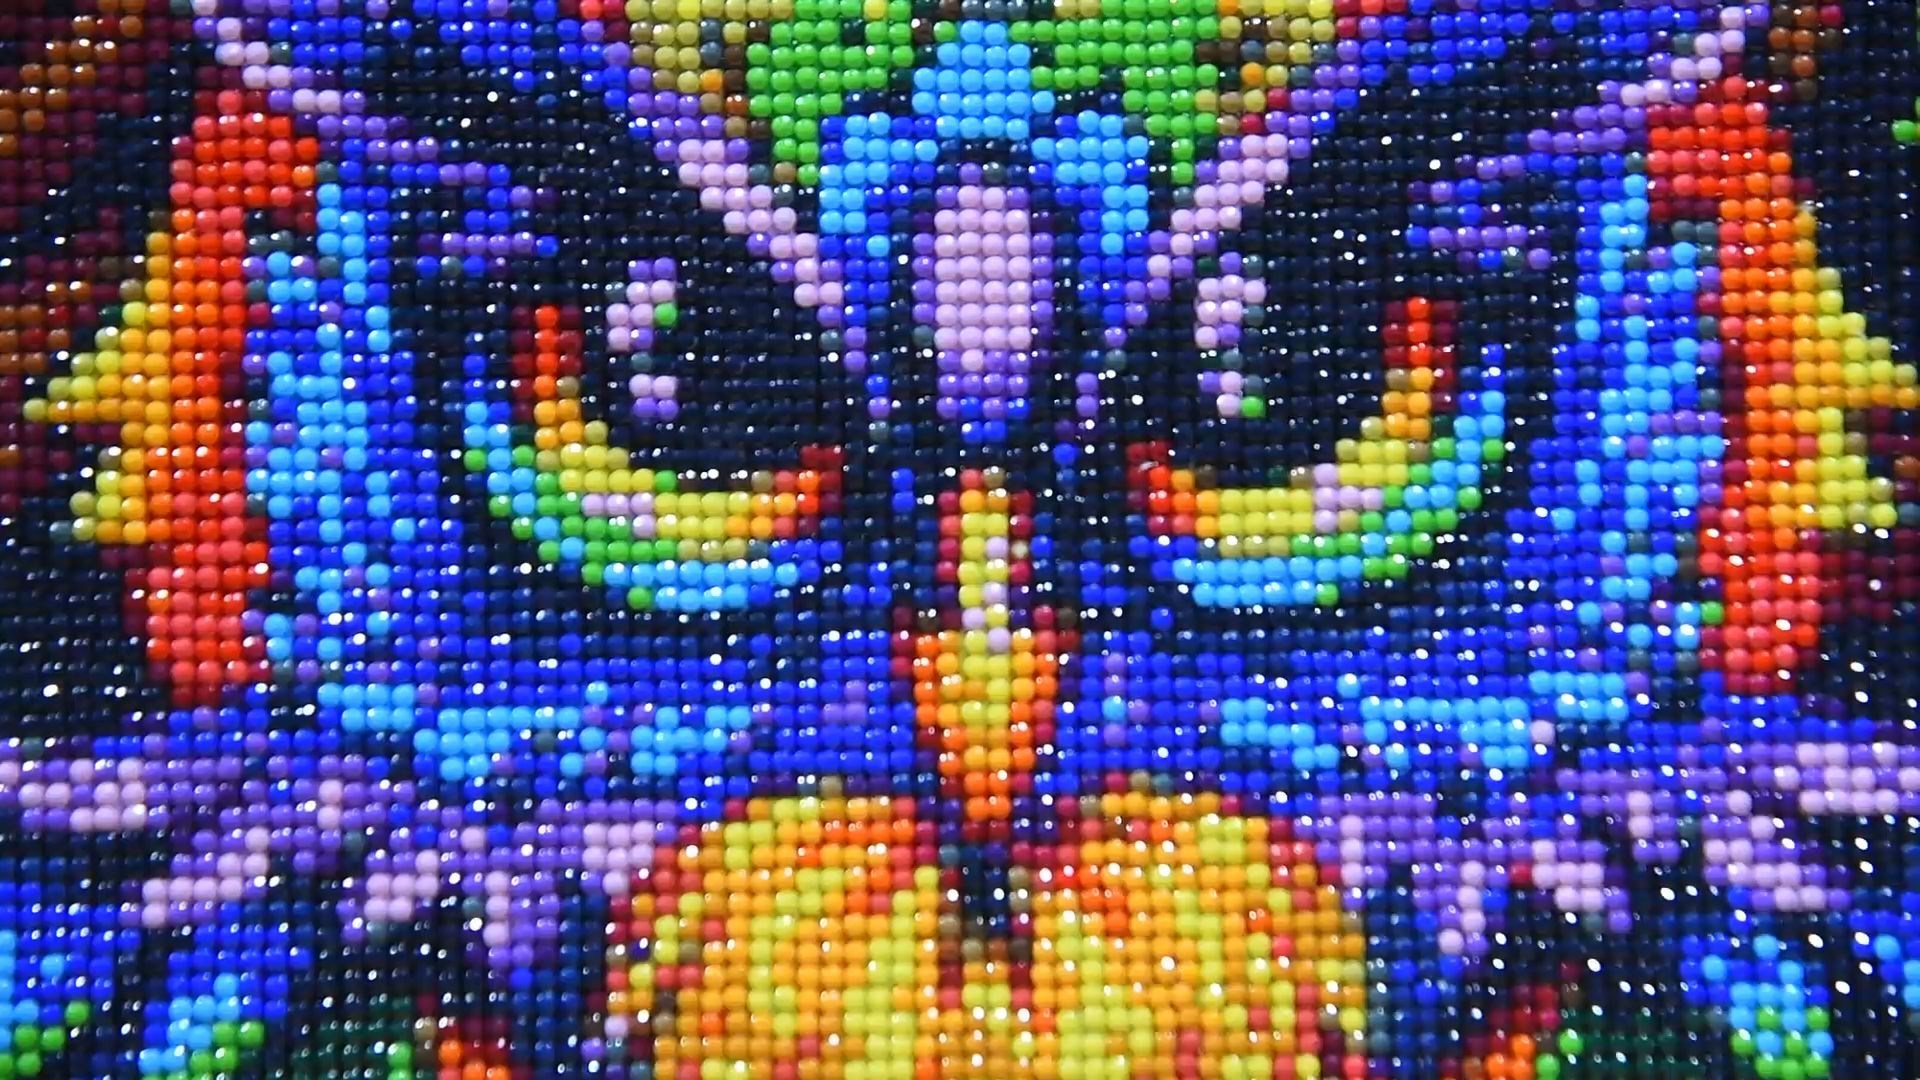 30x40 40x50cm DIY עבודת יד 5D מלא עגול תרגיל צבעוני ארבעה חתולים יהלומי ציור בעלי החיים